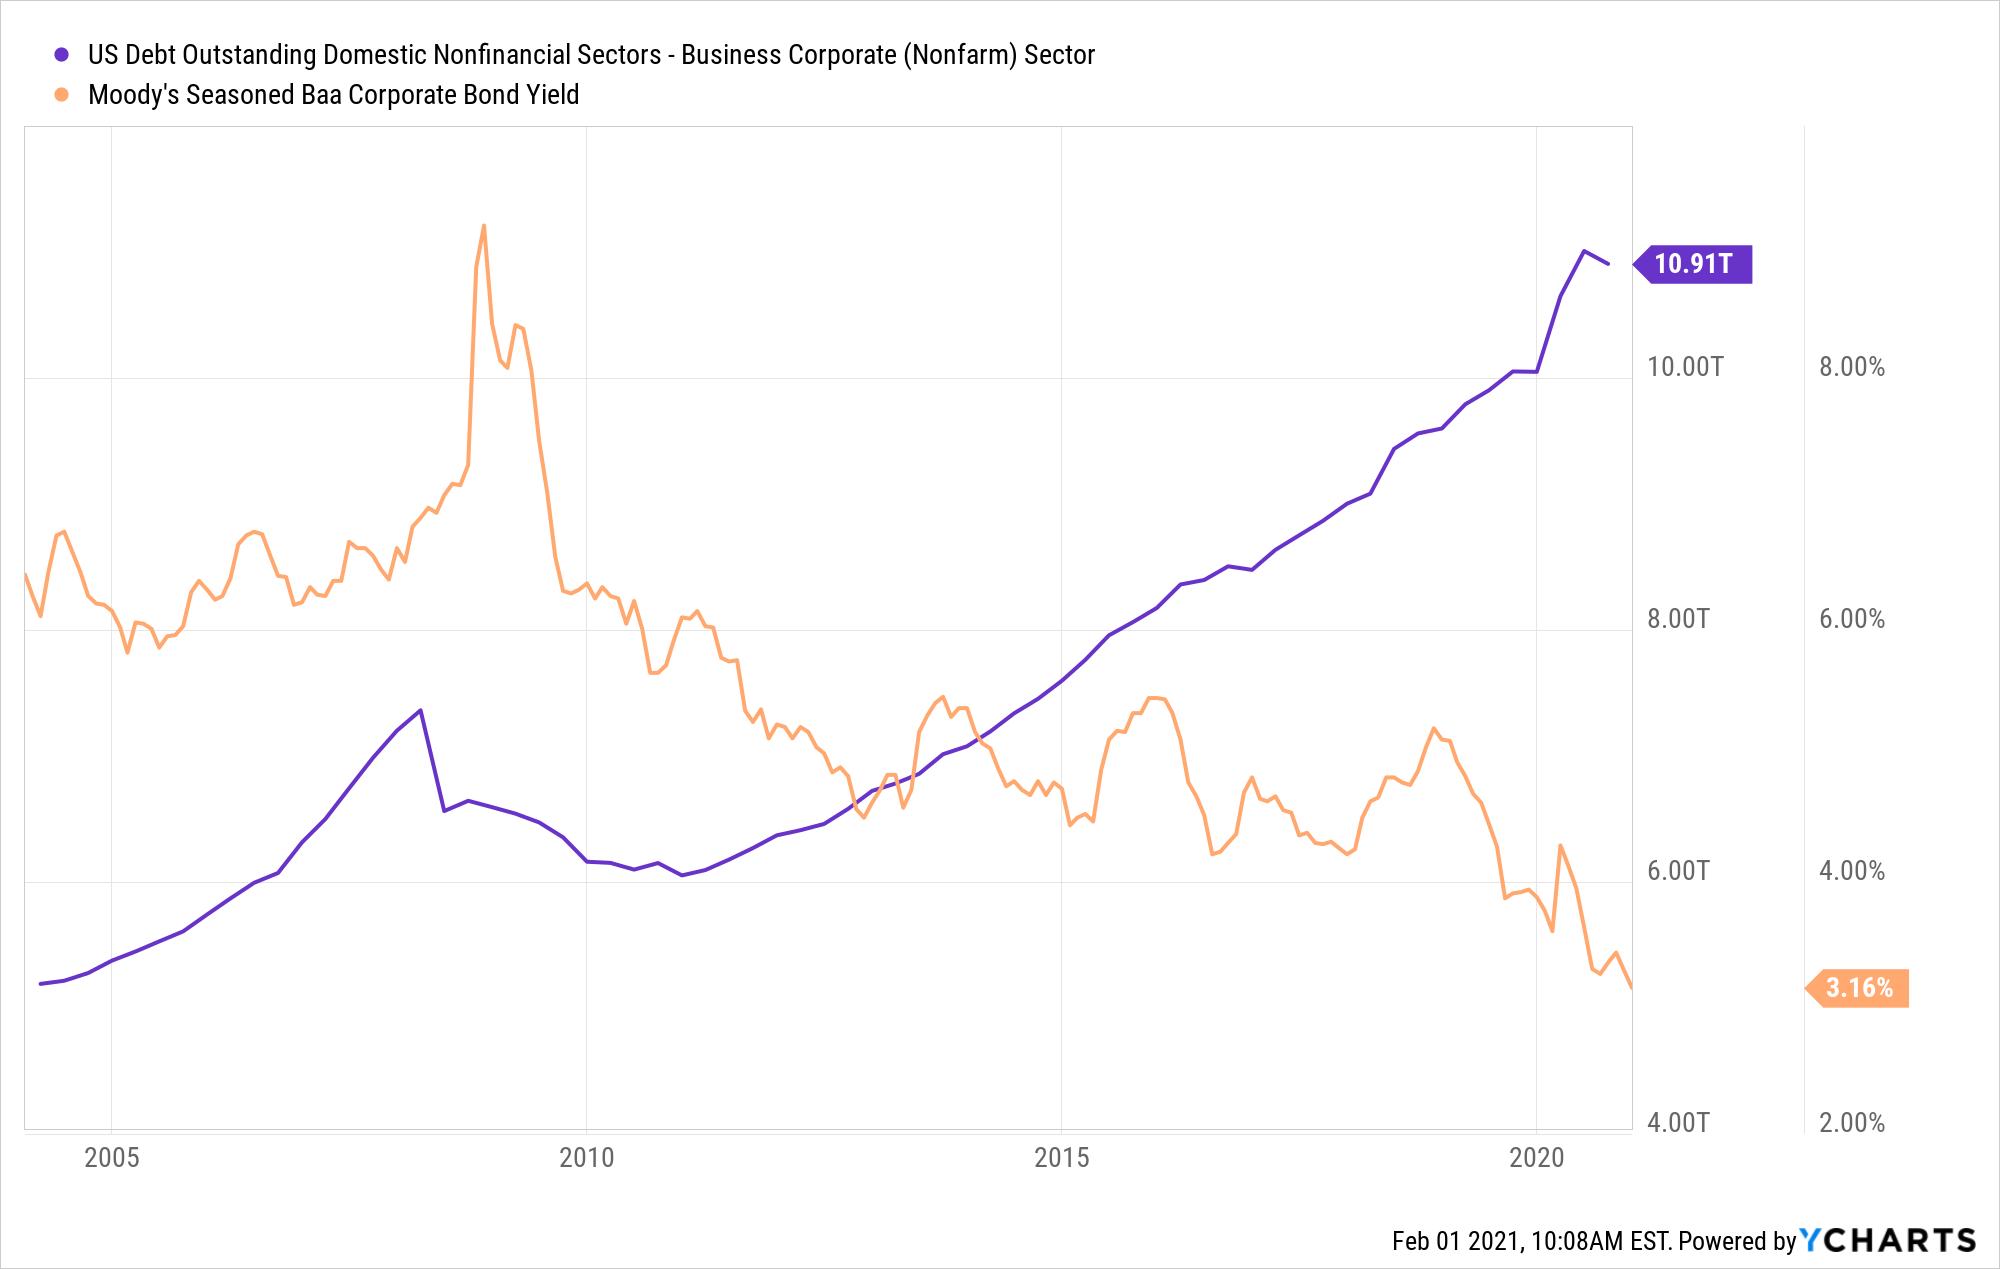 US Debt Outstanding Domestic Nonfinancial Sectors - Business Corporate (Nonfarm) Sector Chart